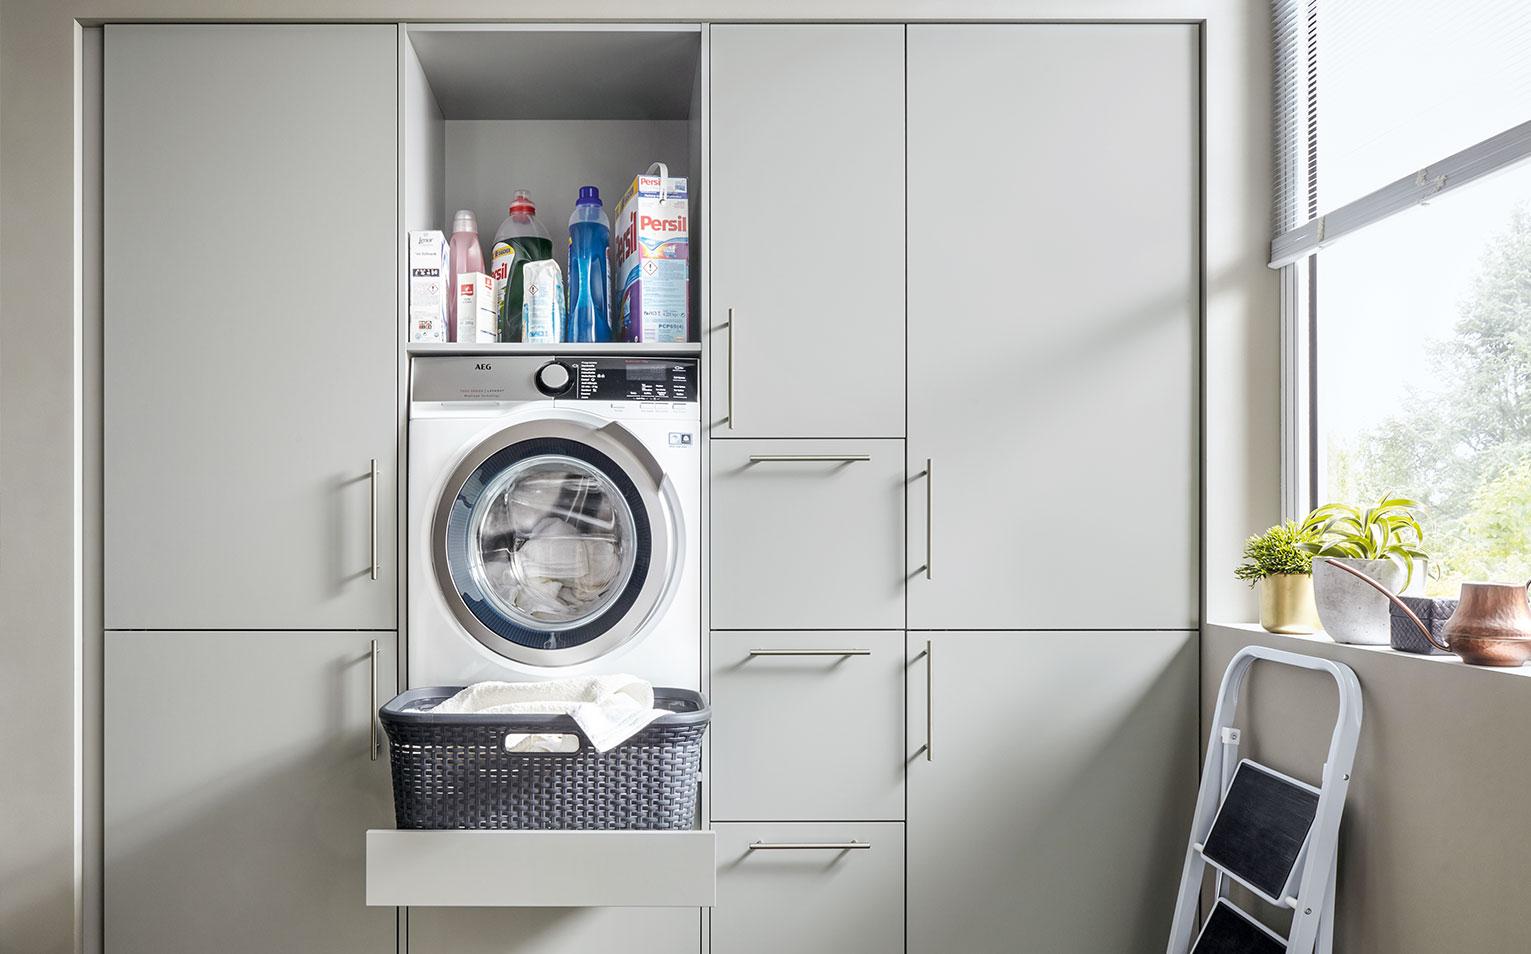 Trend Hauswirtschaftsraum Perfekt Organisiert Sauber Verstaut